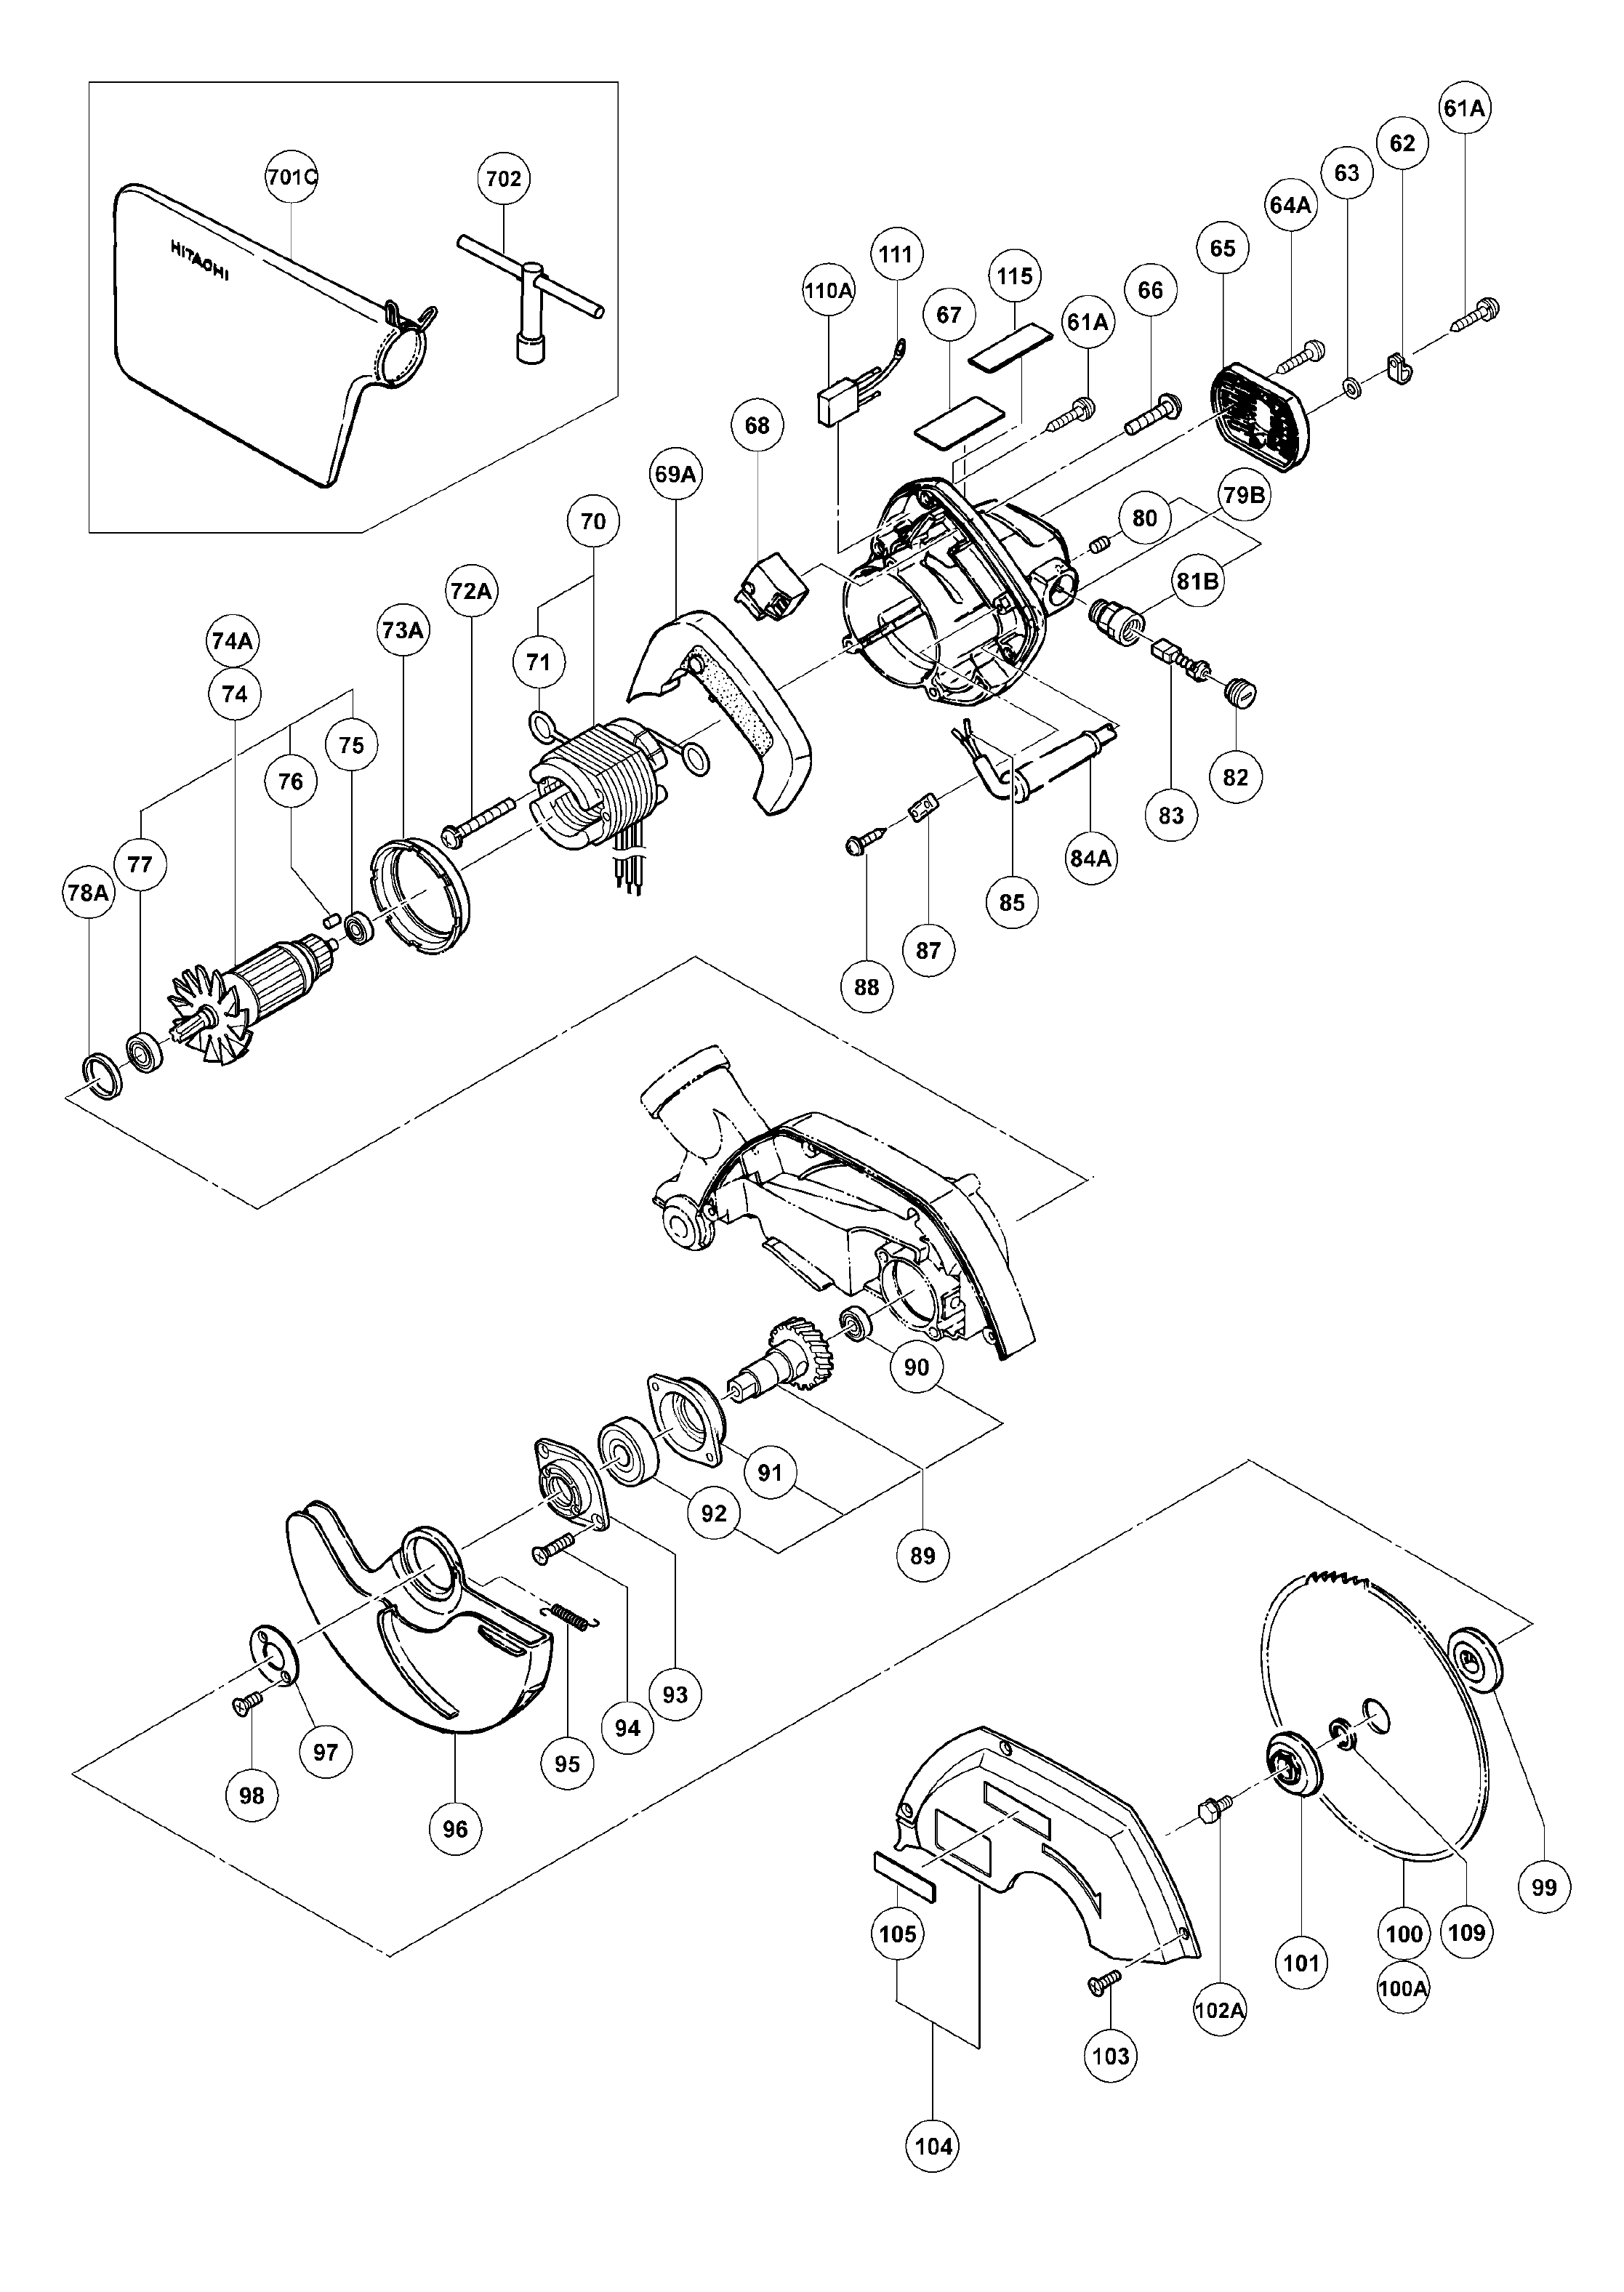 C8FC-Hitachi-PB-1Break Down